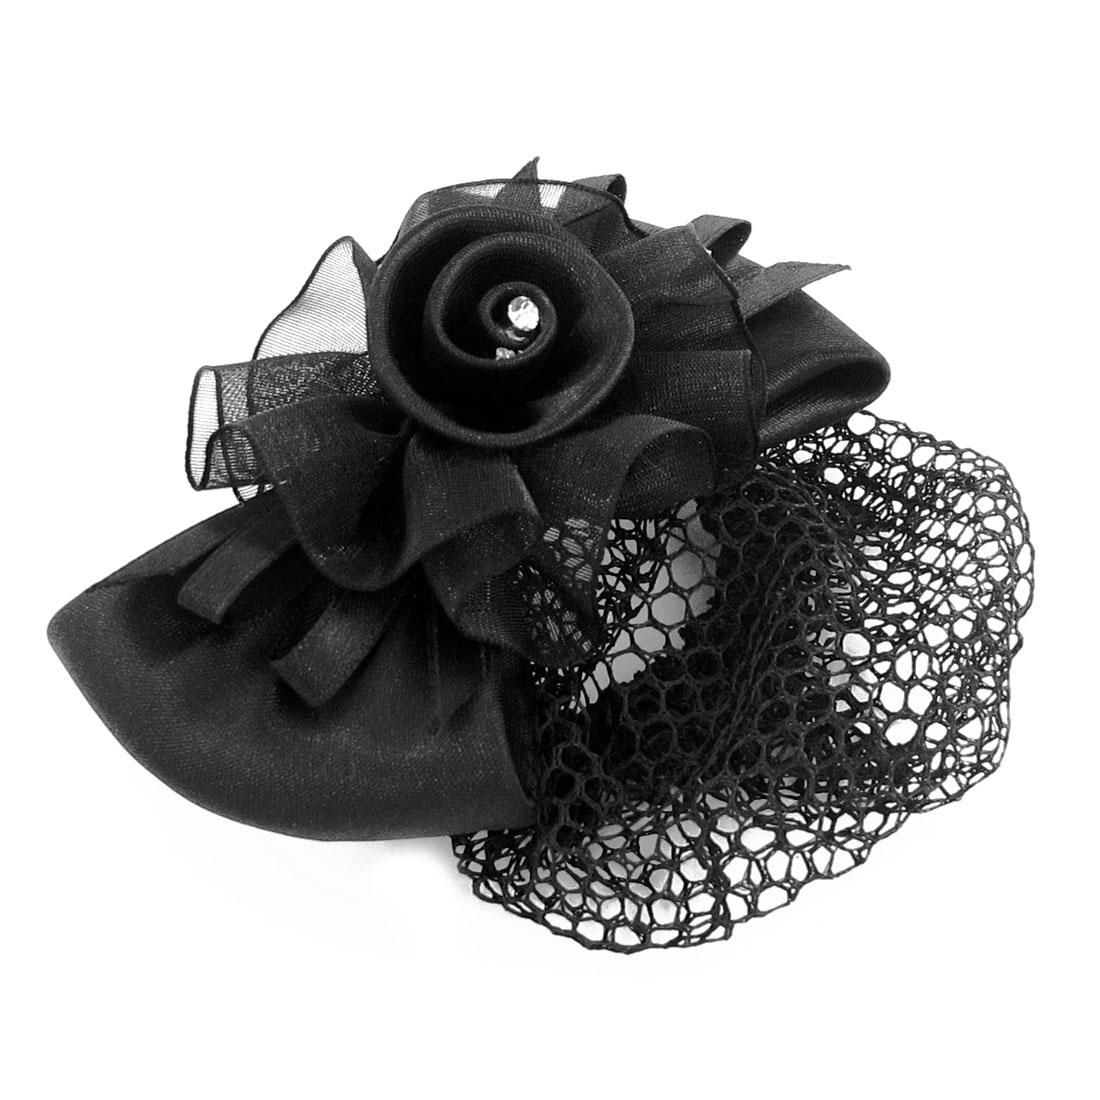 Black Floral Bowknot Snood Net Barrette Hair Clip Bun Cover for Woman